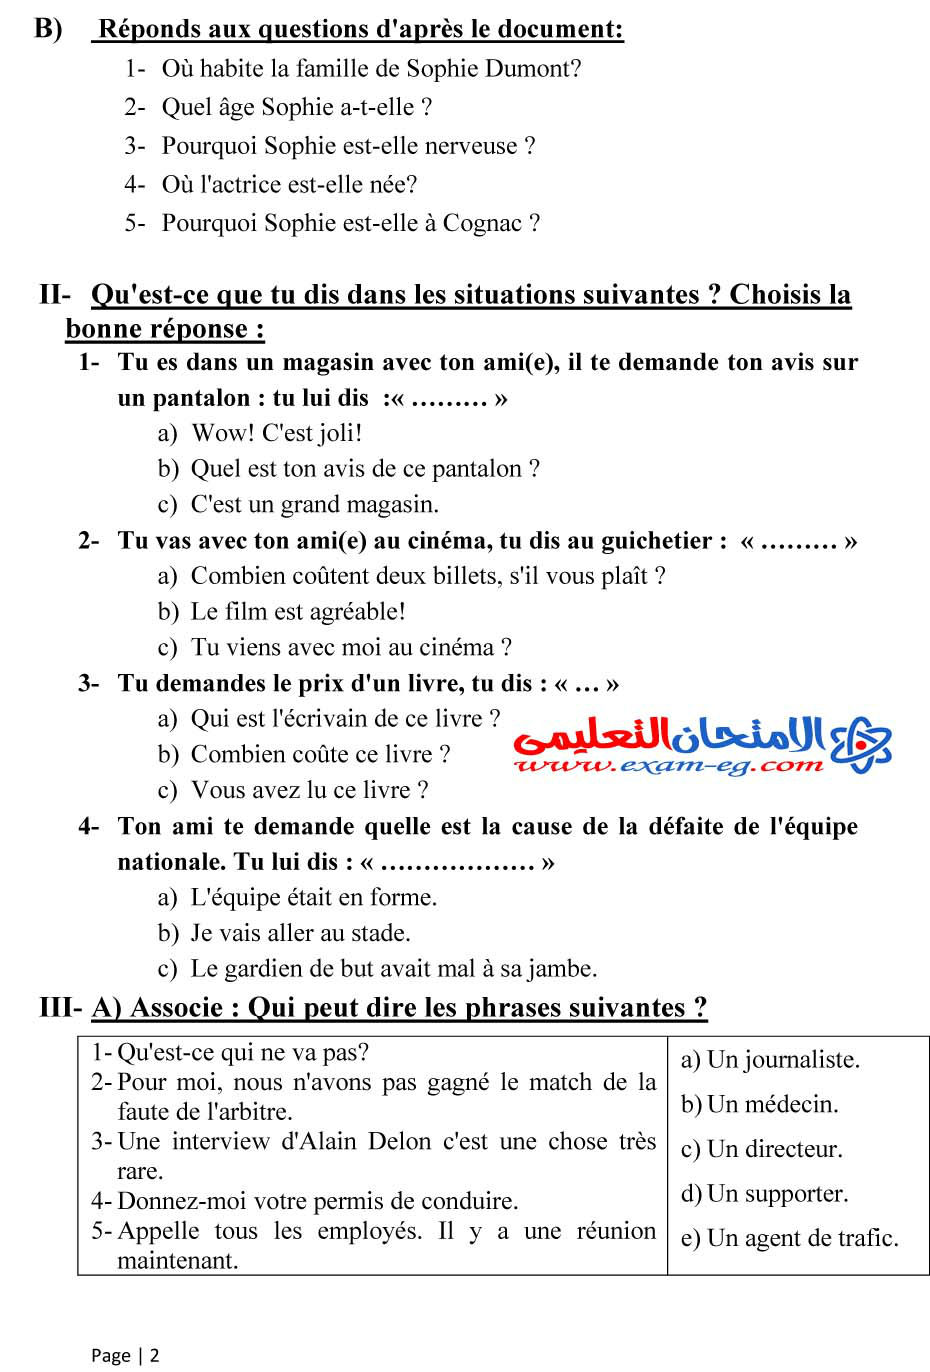 exam-eg.com_1396623545512.jpg